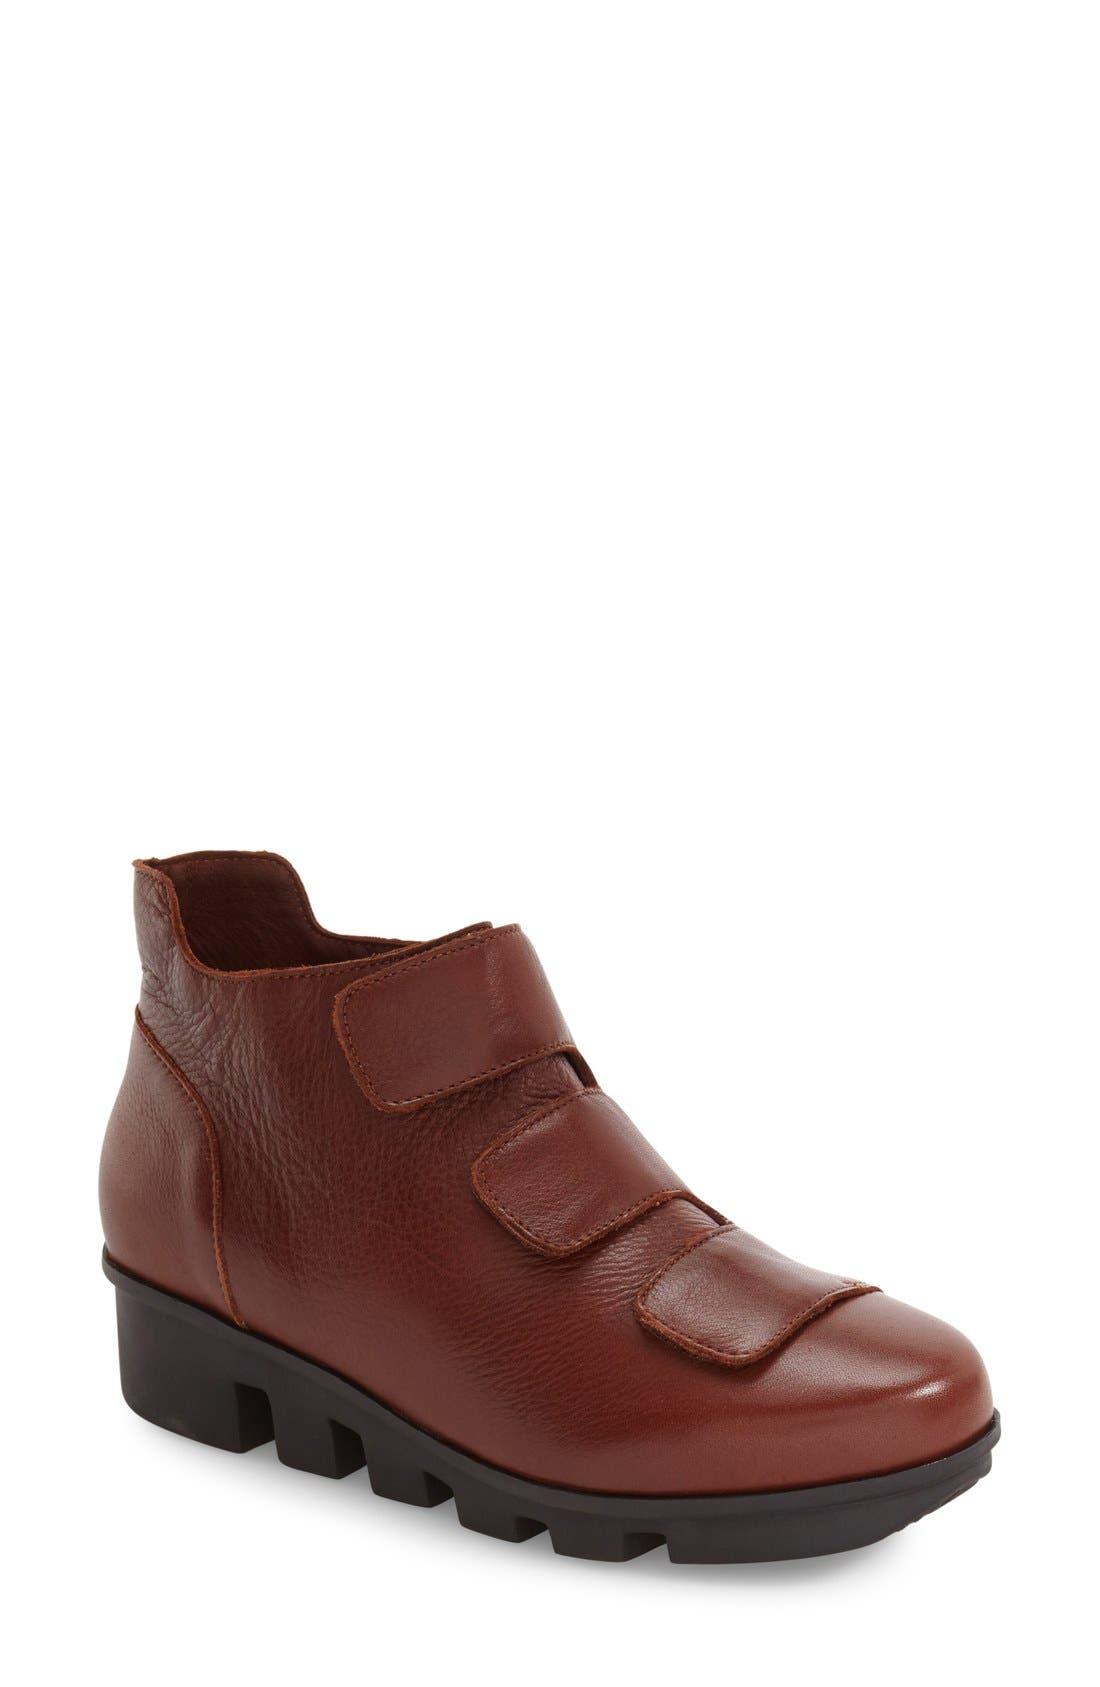 'Harmonee' Sneaker,                         Main,                         color, Brandy Leather